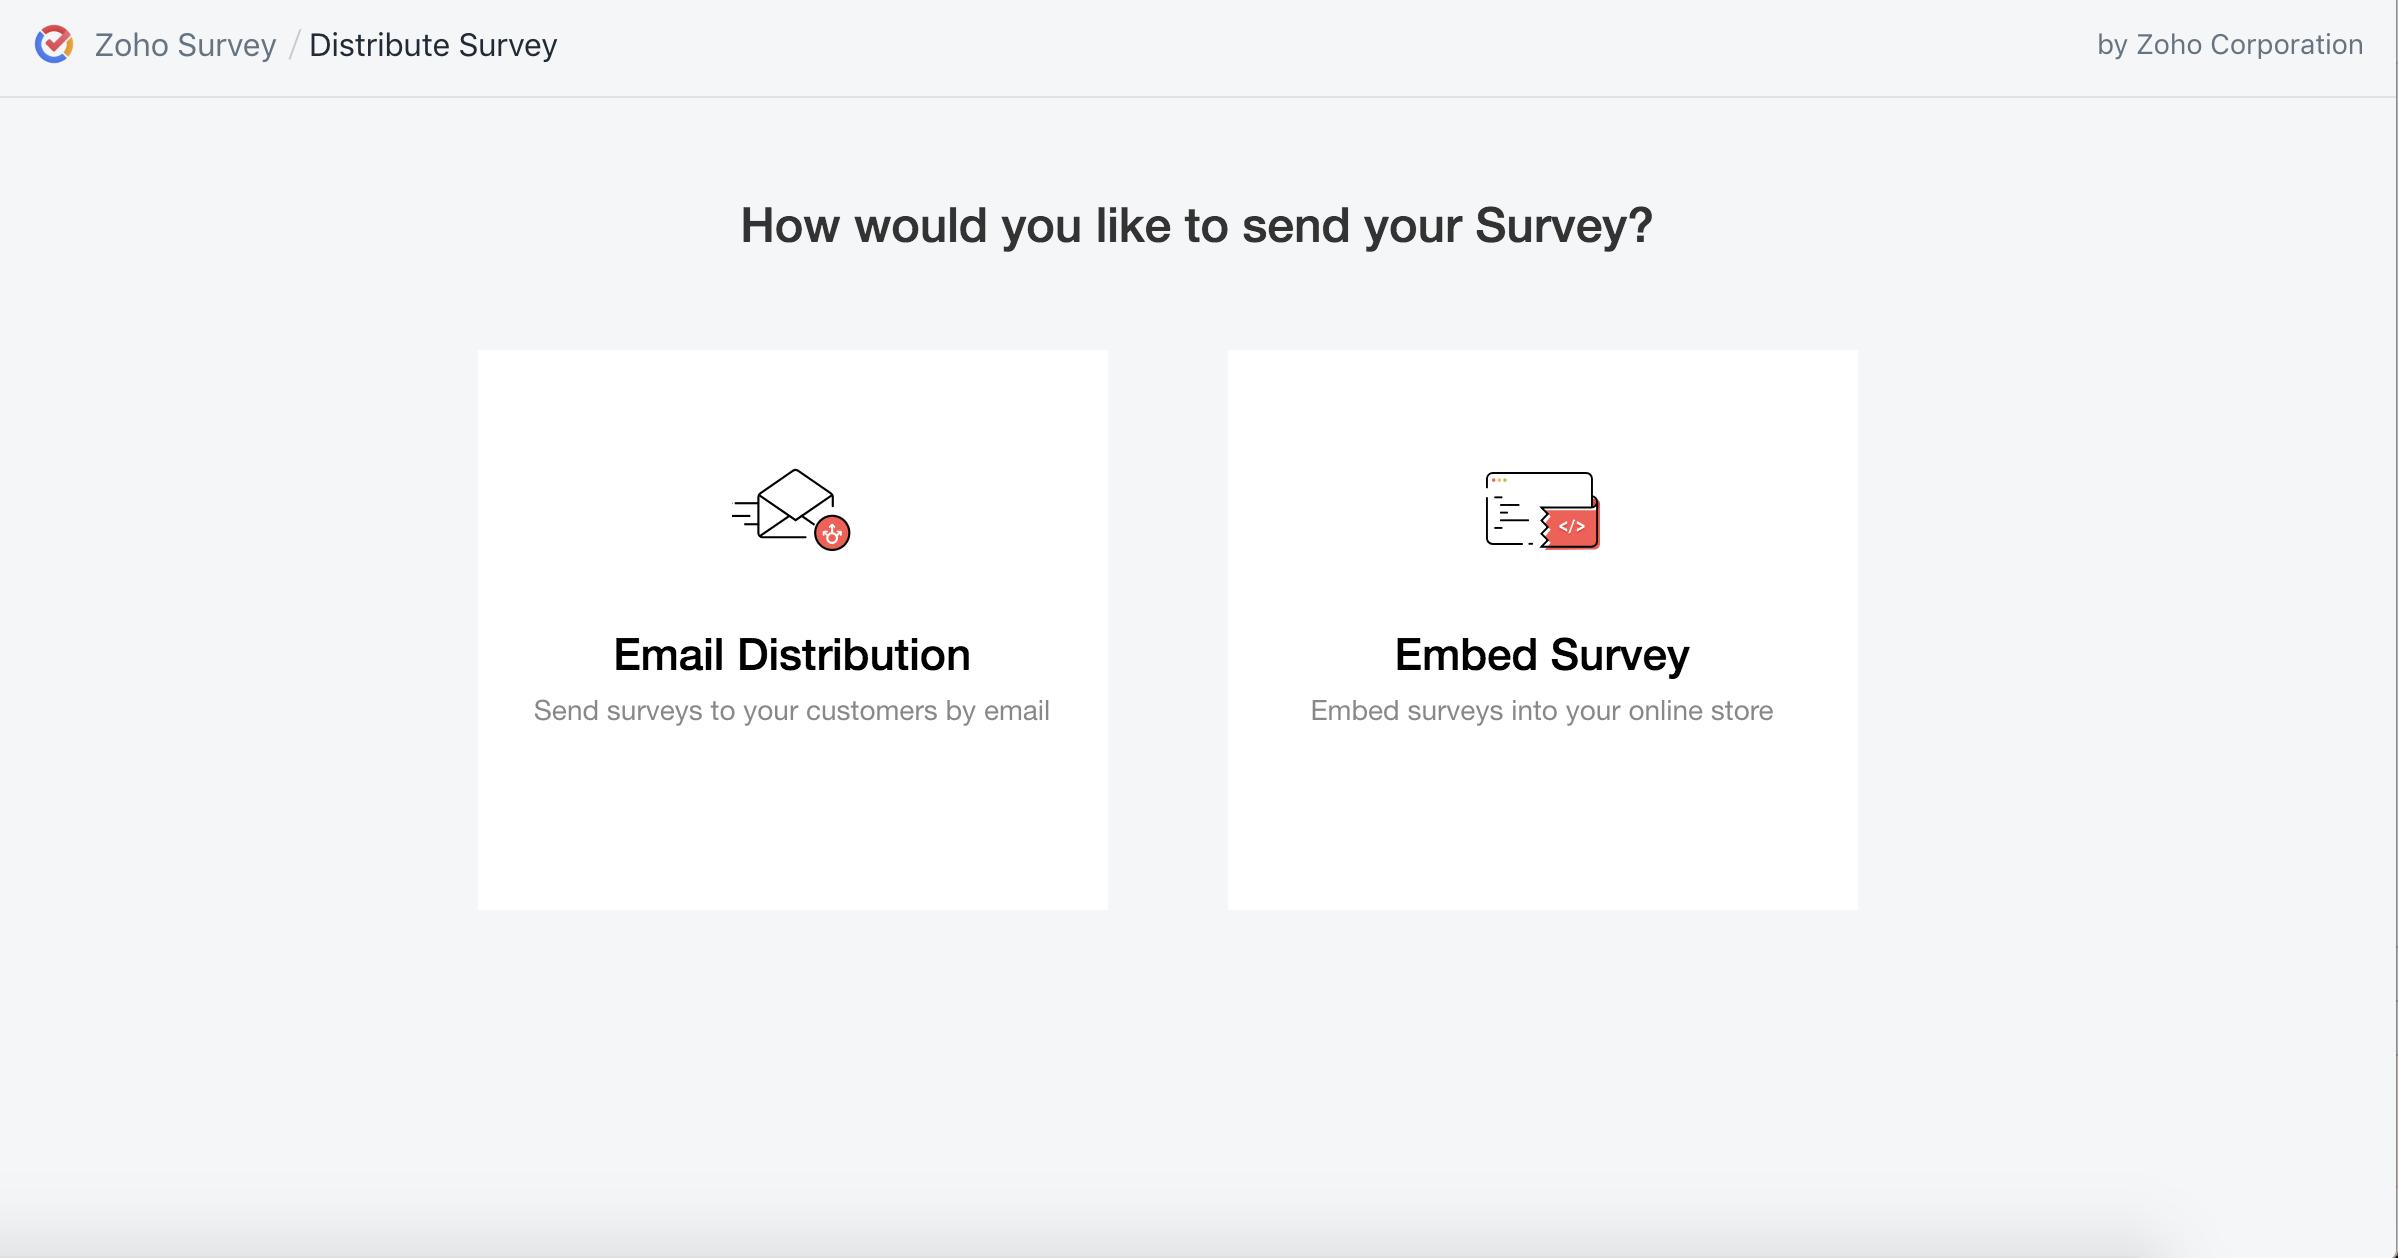 Zoho Survey Shopify distribute survey